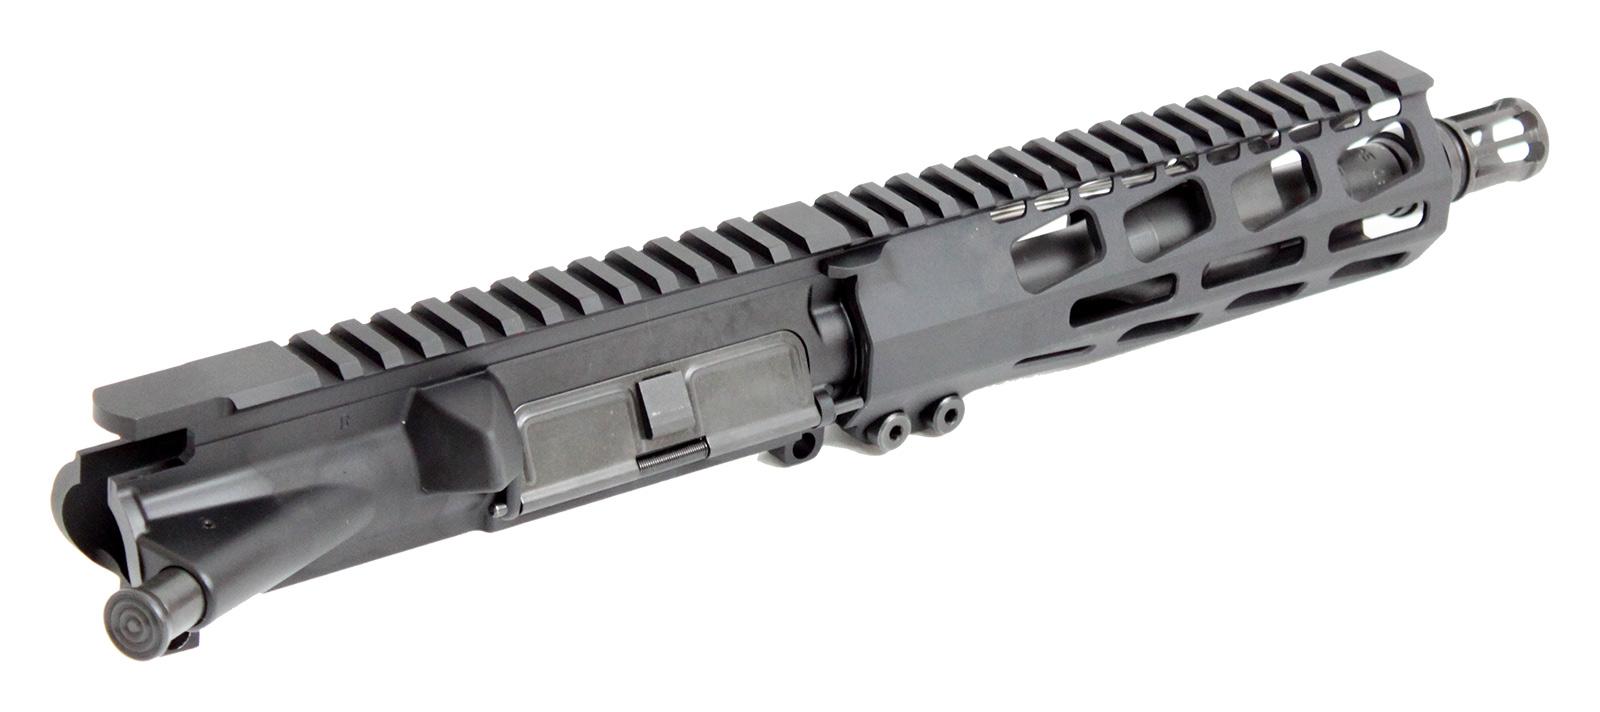 ar15-upper-assembly-7-5-inch-223-wylde-17-160028-2